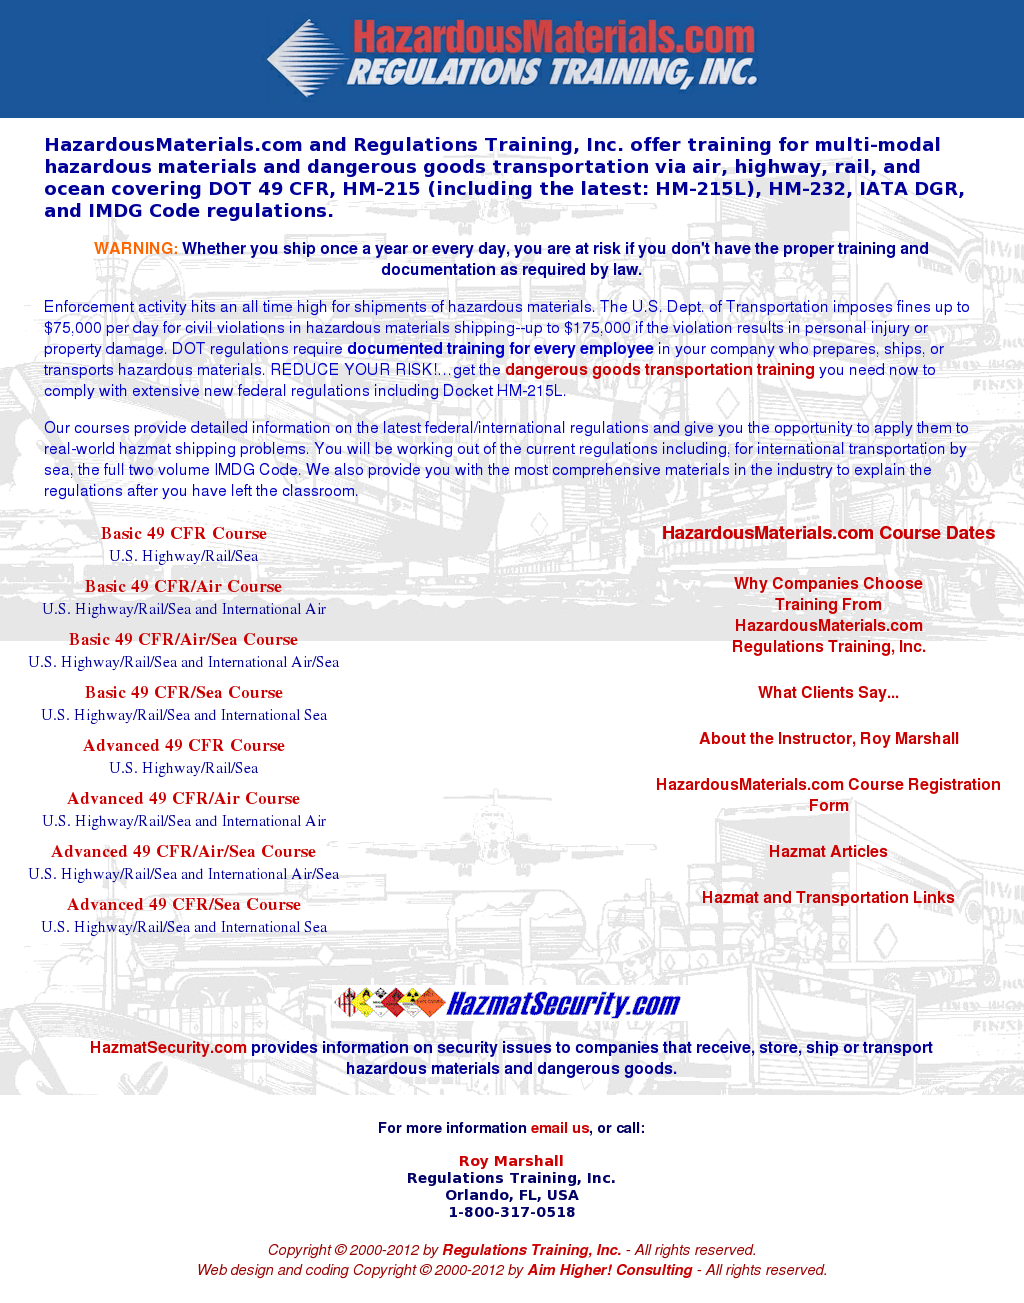 Hazardousmaterials Competitors, Revenue and Employees